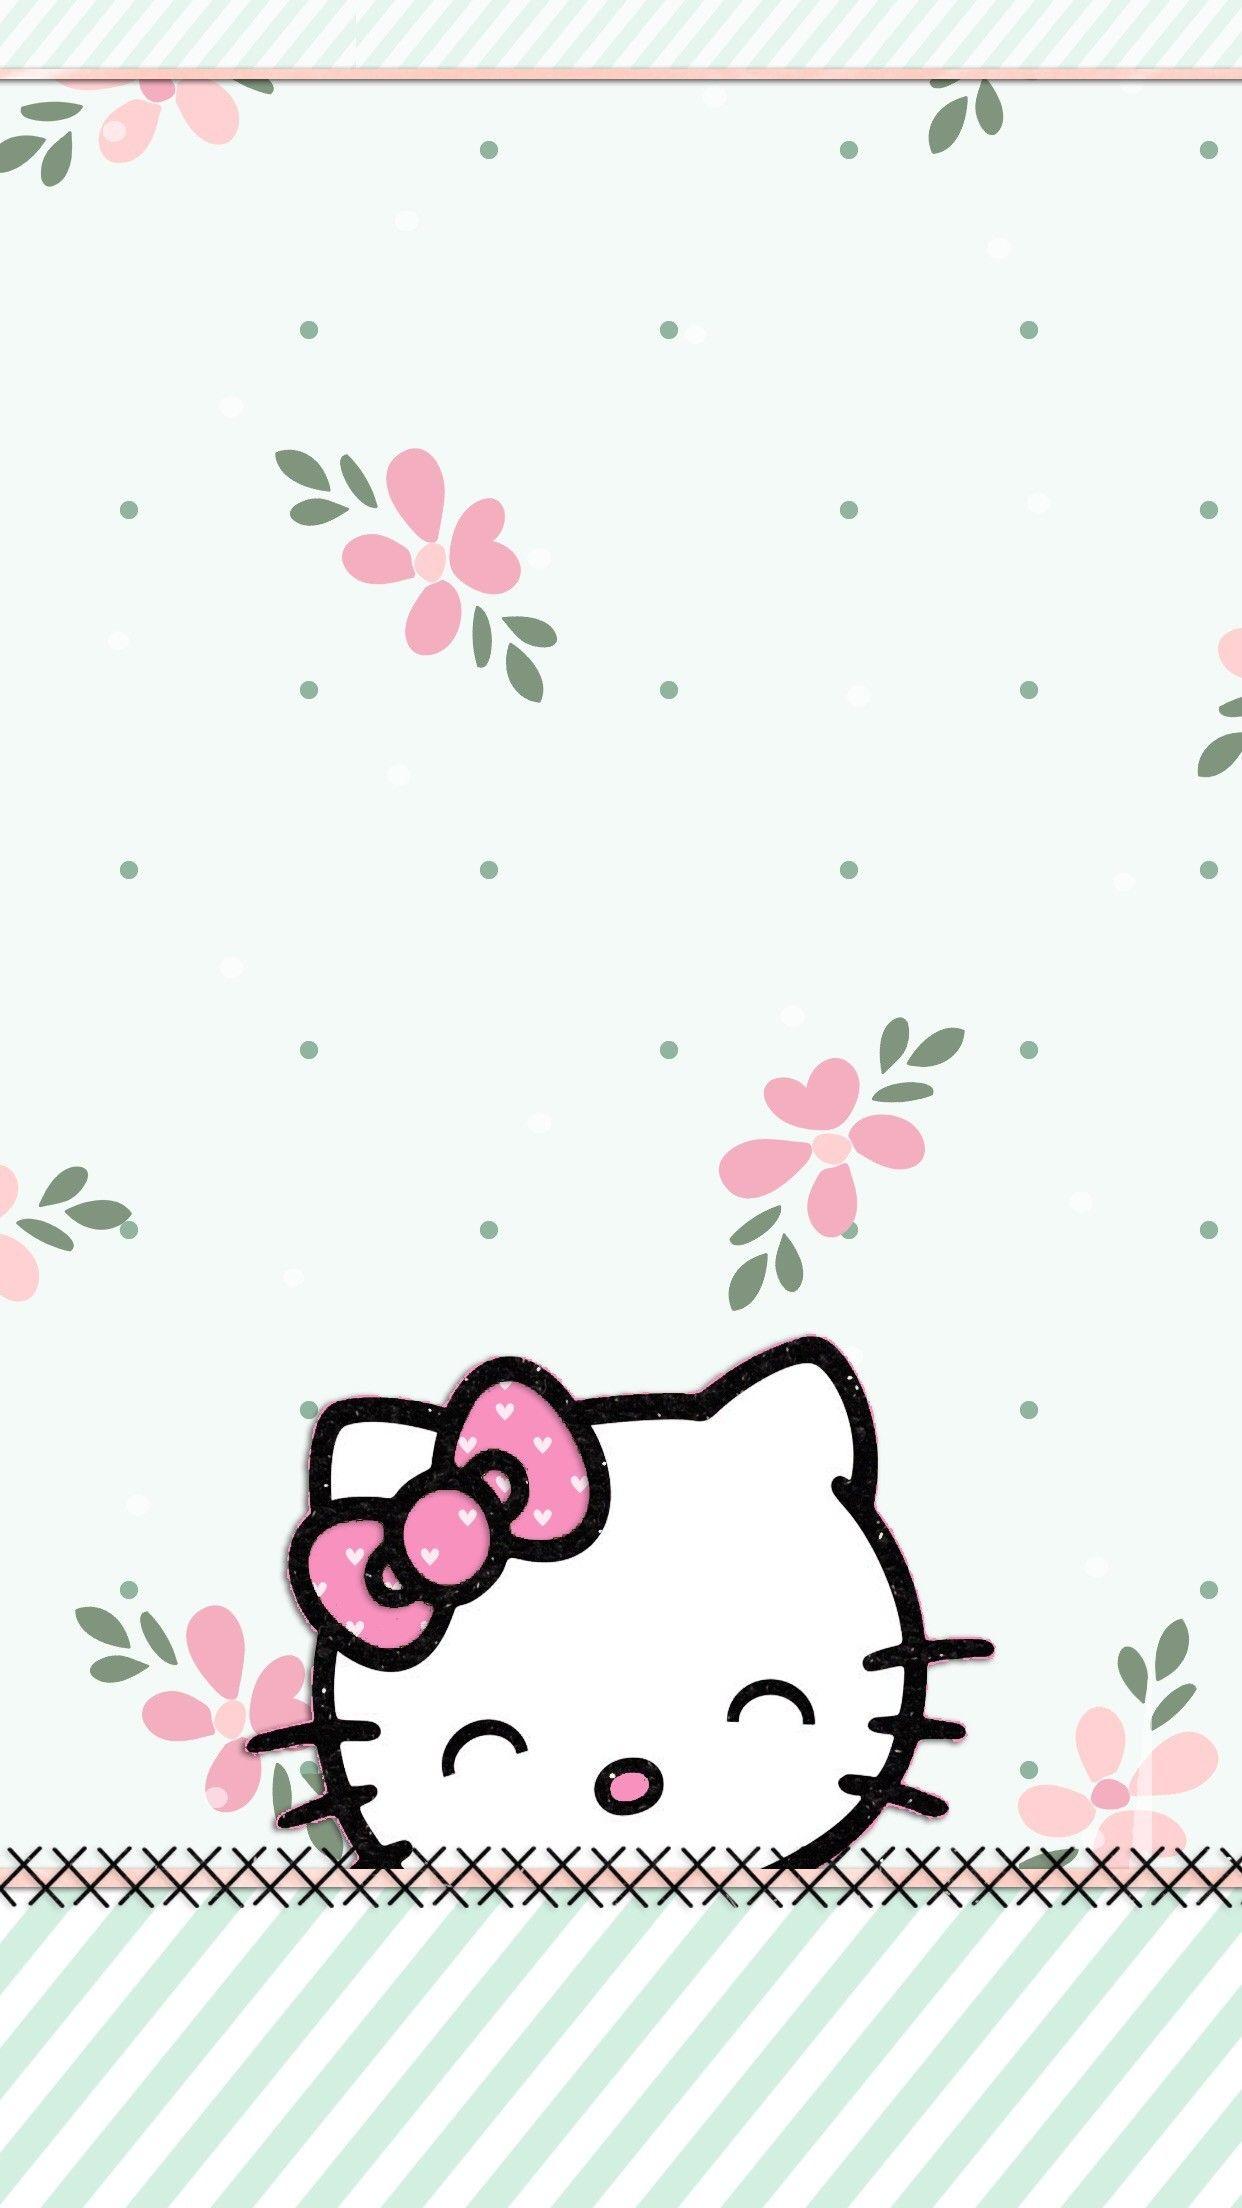 53 Pictures Of Hello Kitty Wallpaper On Wallpapersafari